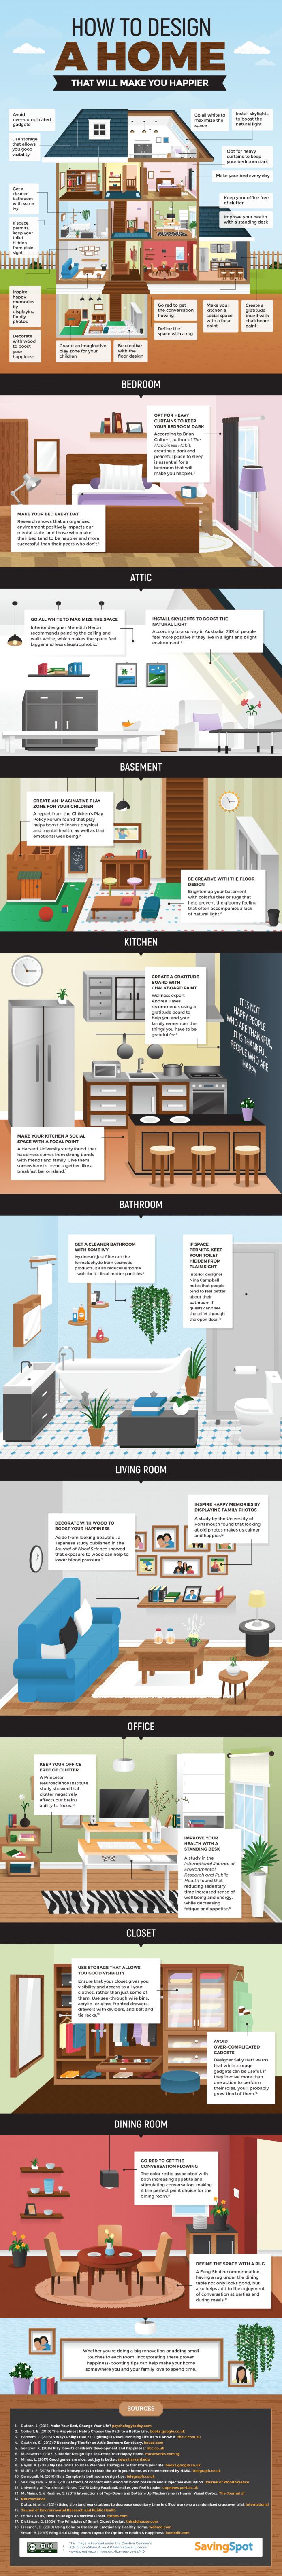 Design Ideas for a Happier Home